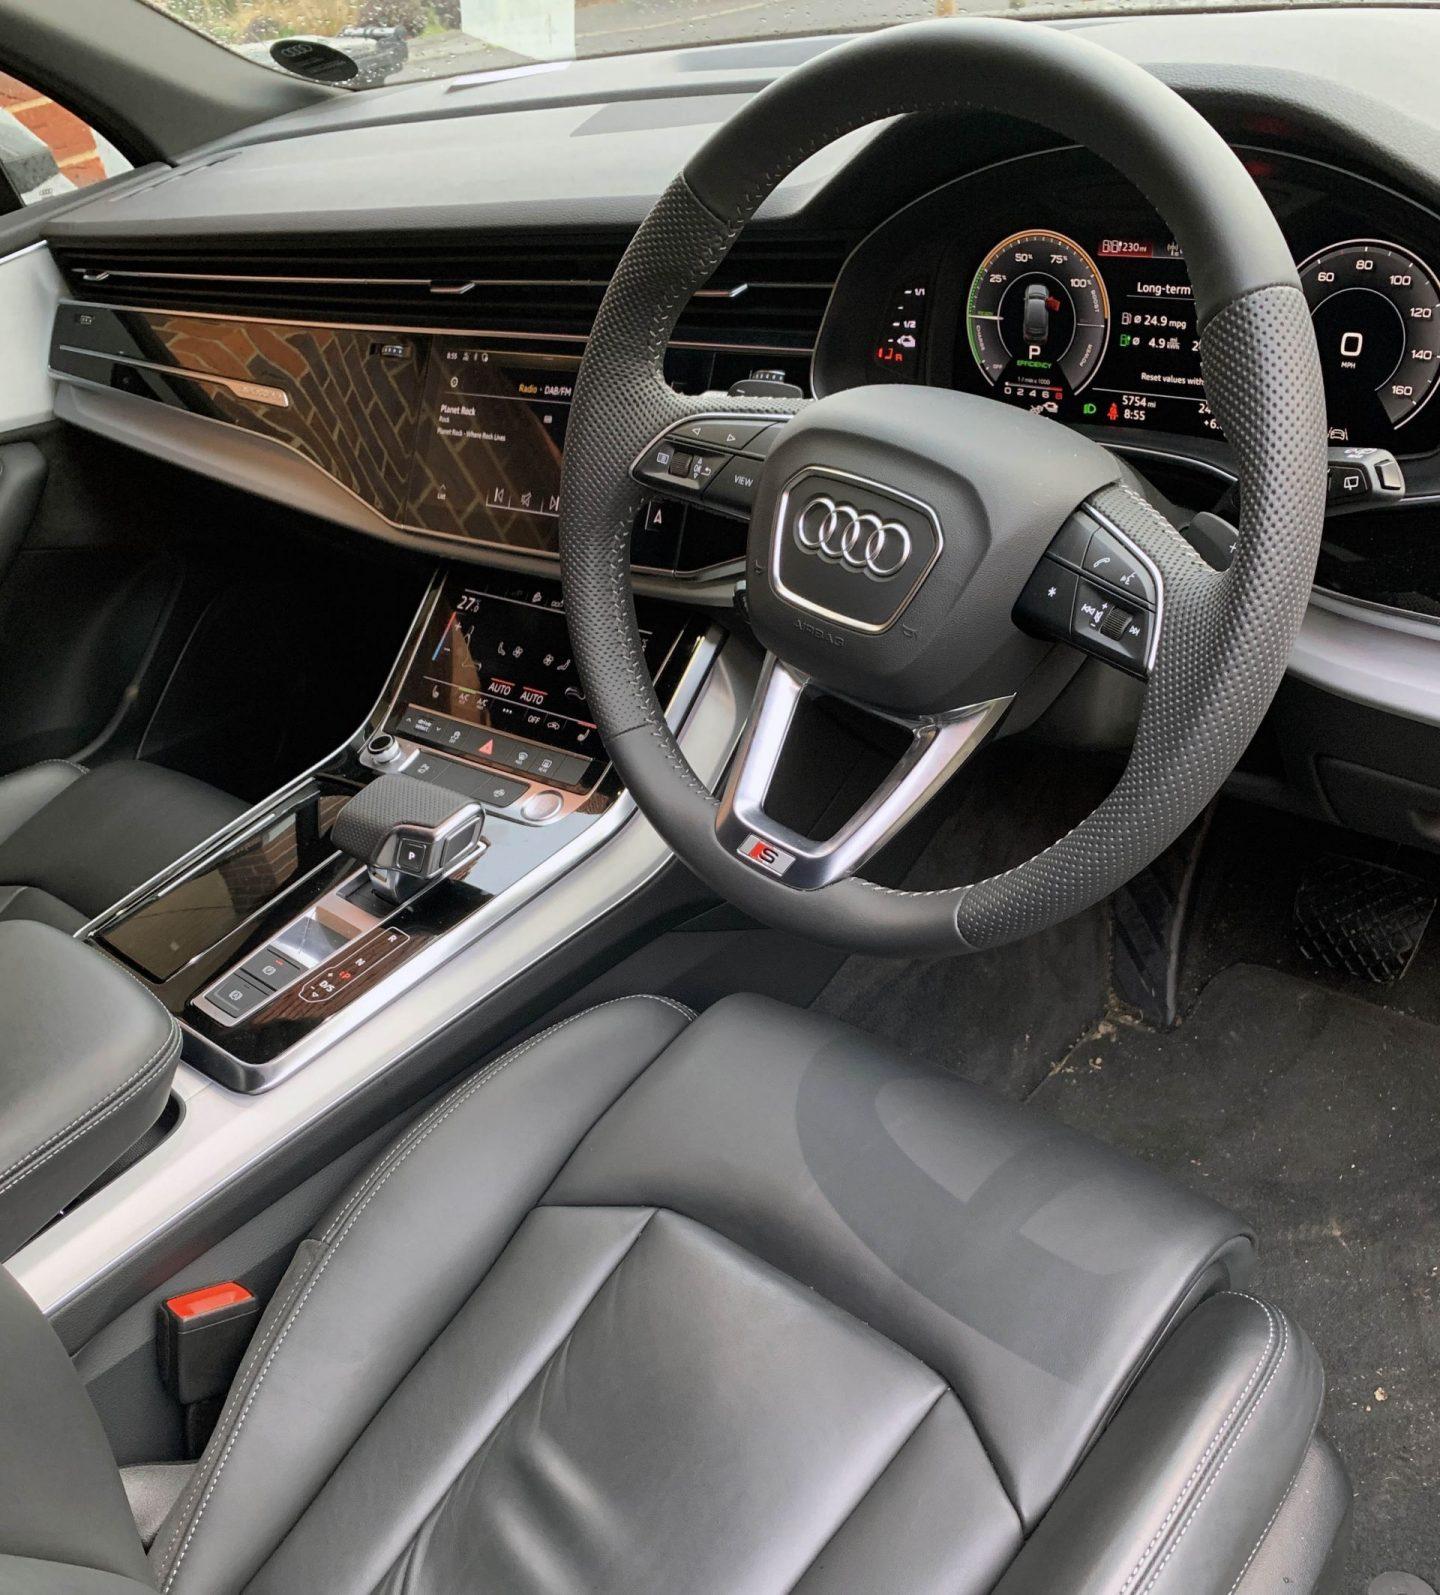 Interior of Audi hybrid Q7 SUV